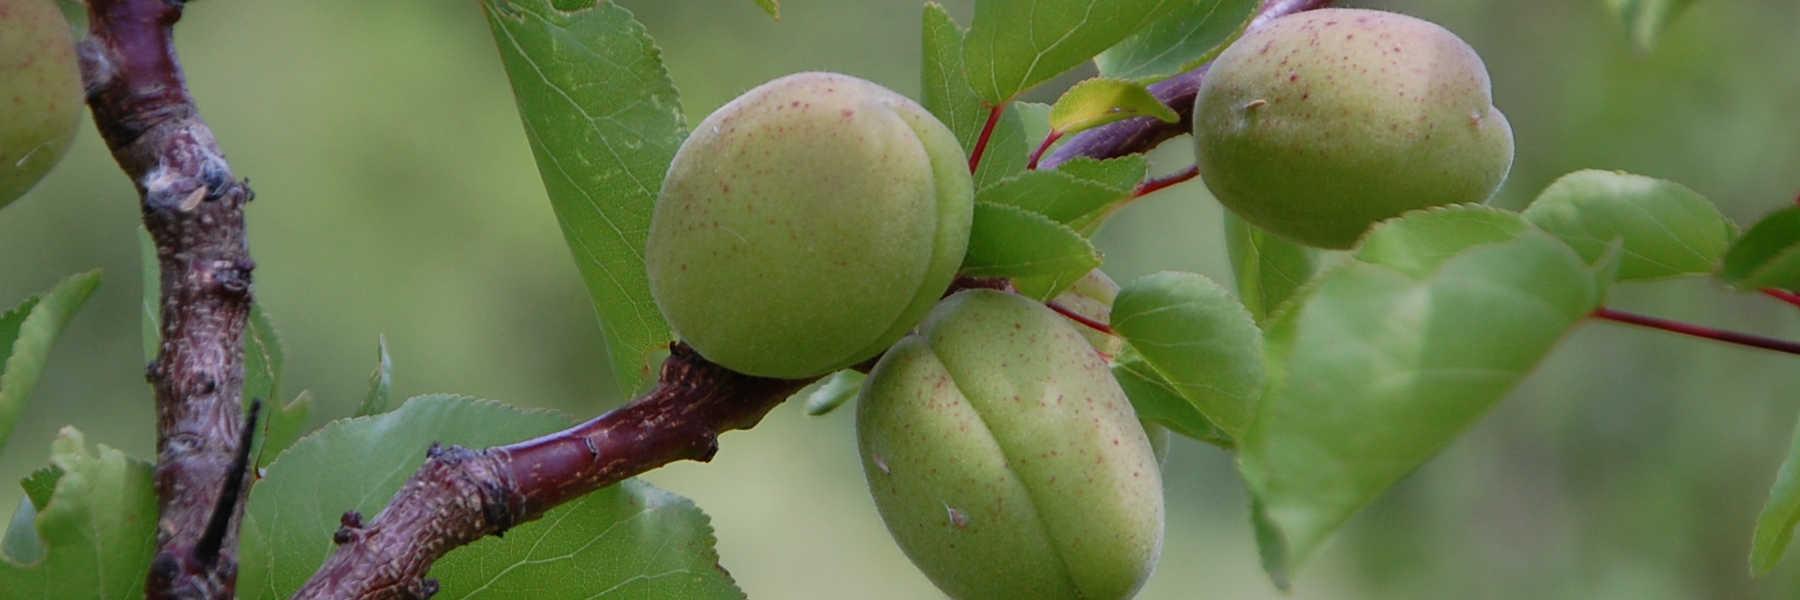 Producteur d'arbres fruitiers bio